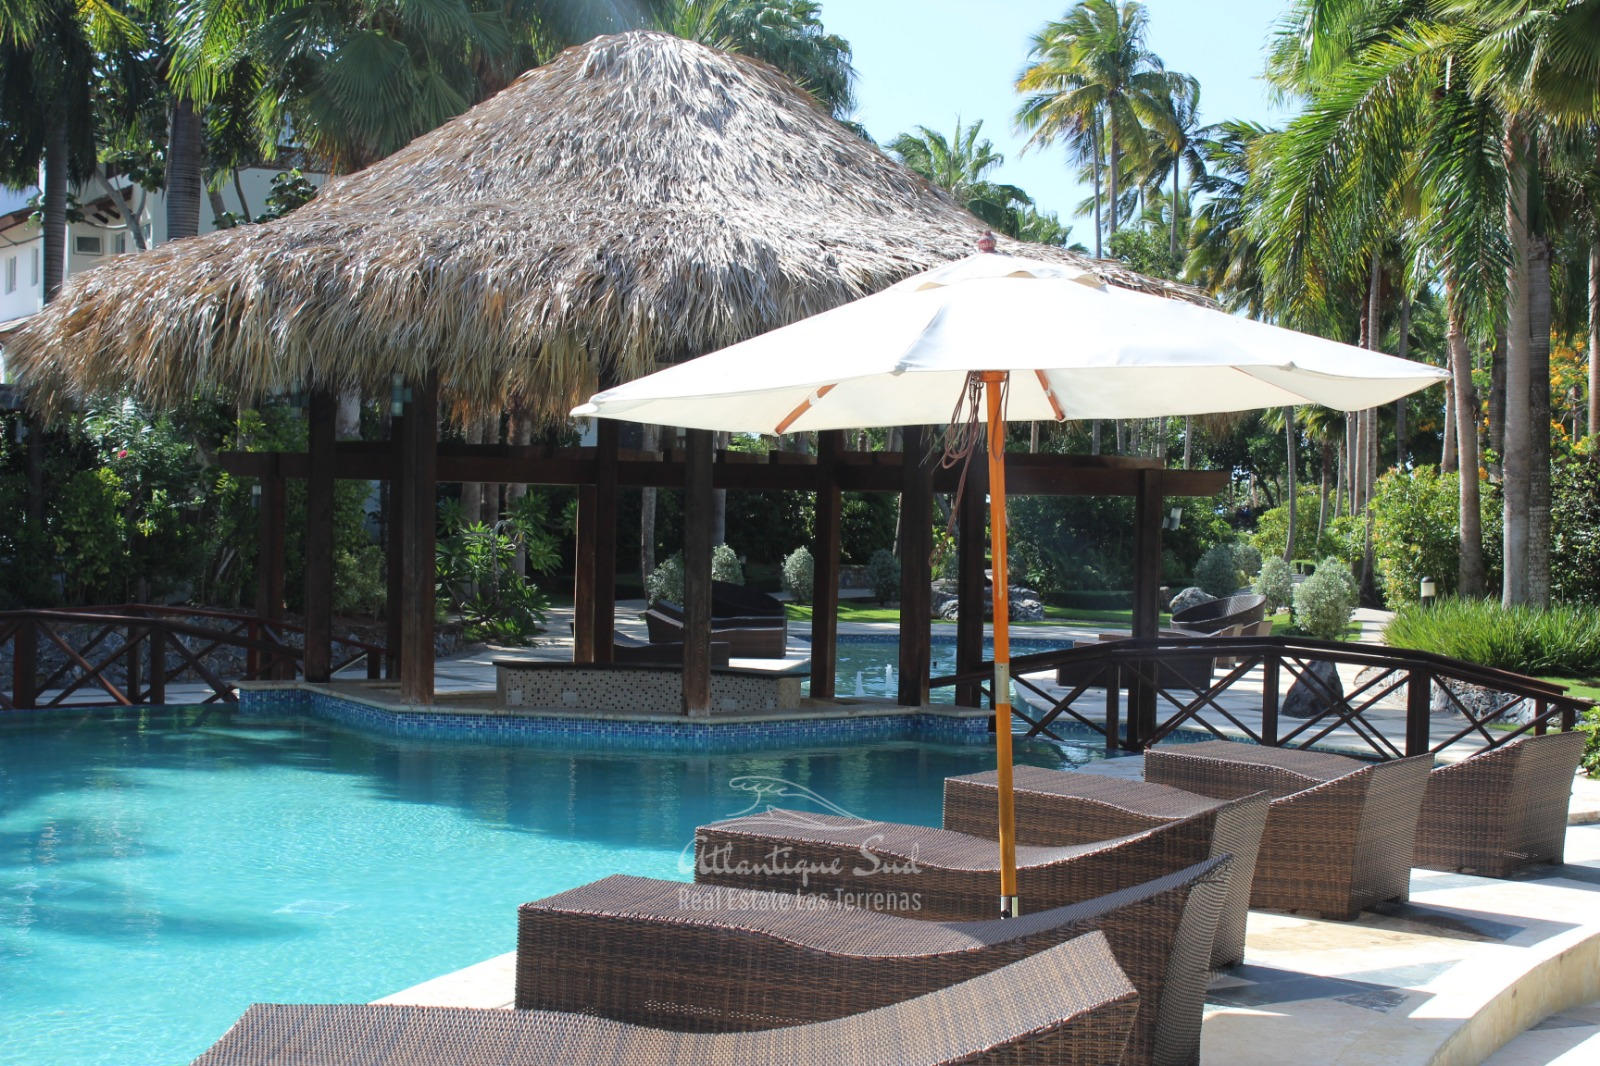 Apartments near the beach real estate las terrenas dominican republic52.jpg